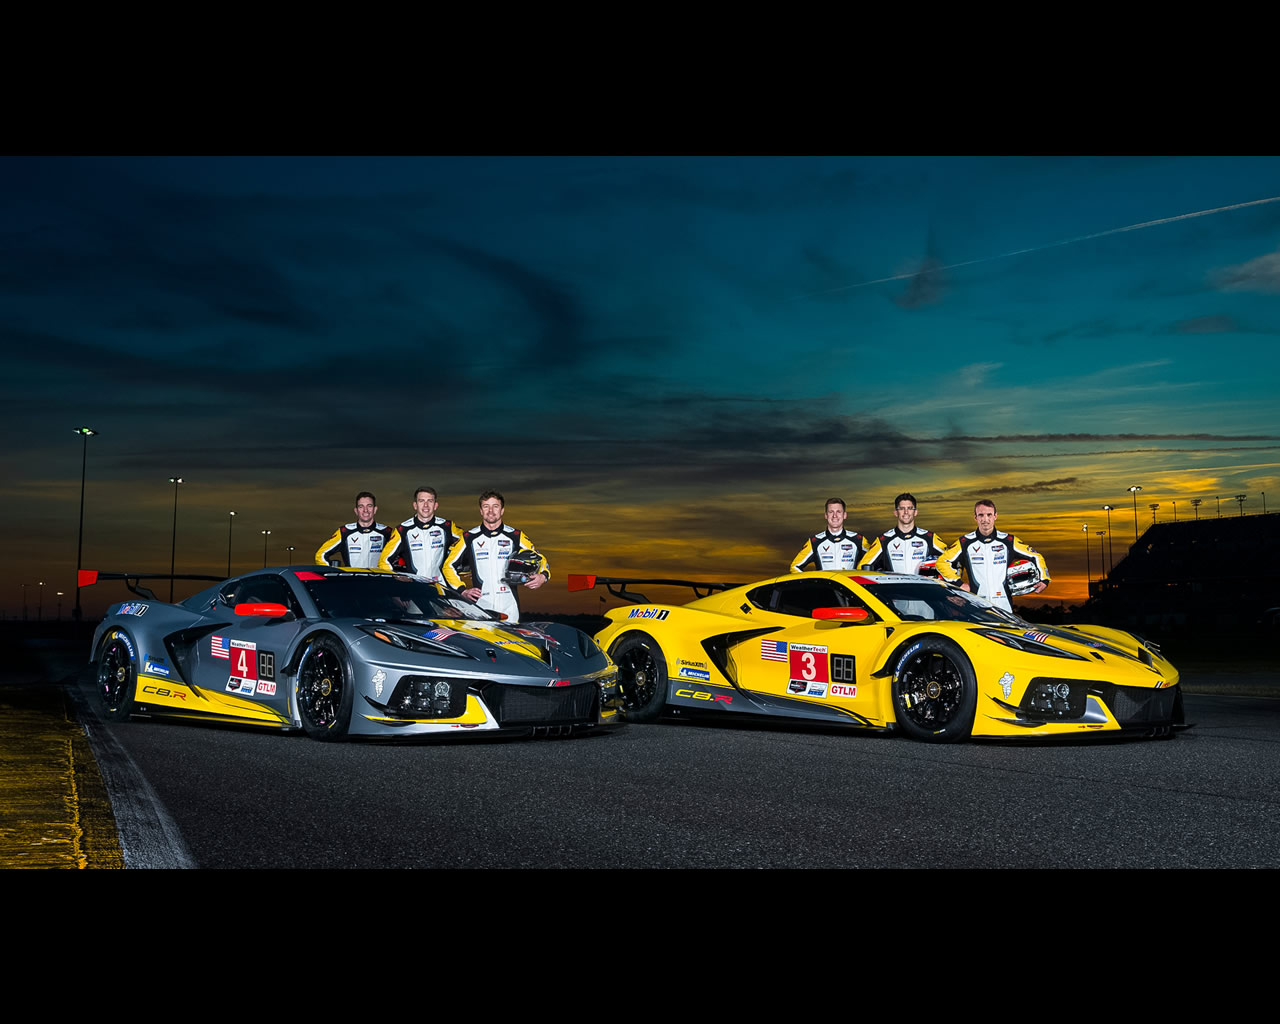 Corvette C8-R mid-engined racing car ready for 2020 season